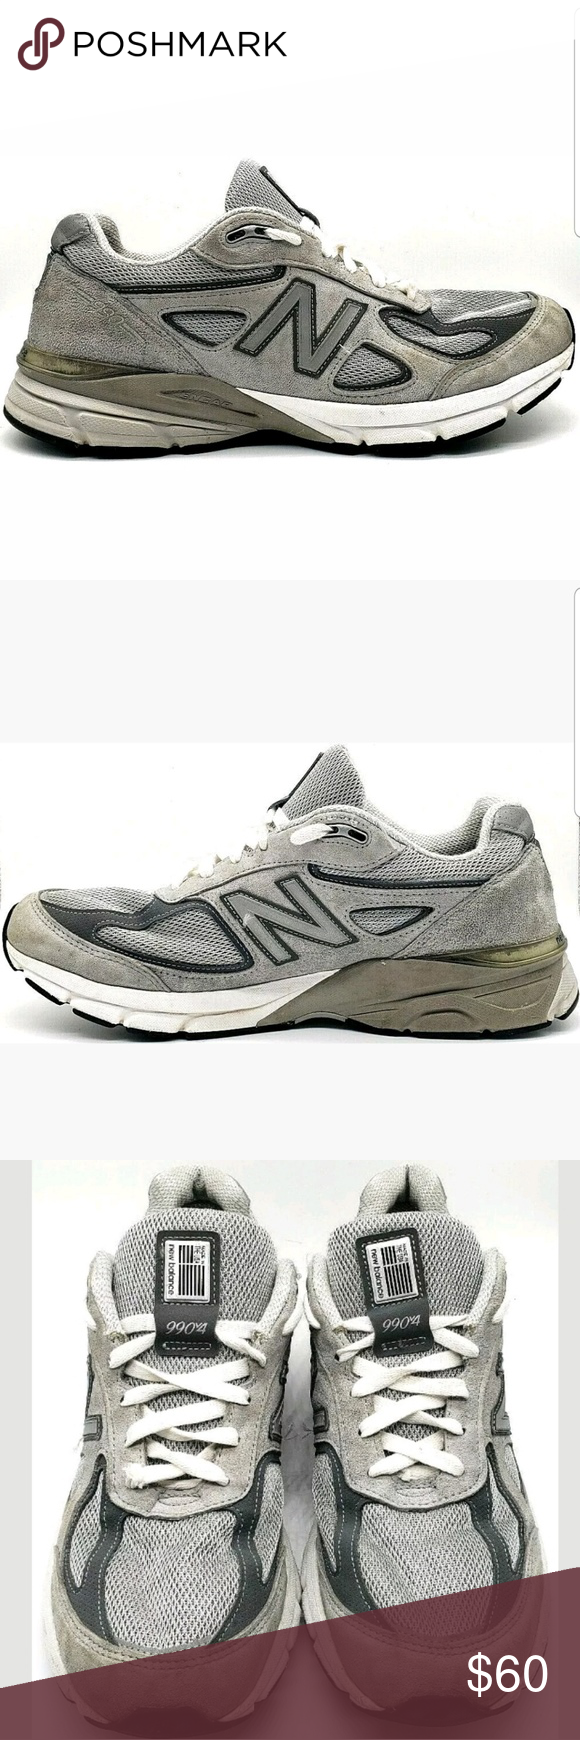 promo code 9dde1 20389 Mens New Balance 990v4 Sneakers M990GL4 Suede USA Mens New ...